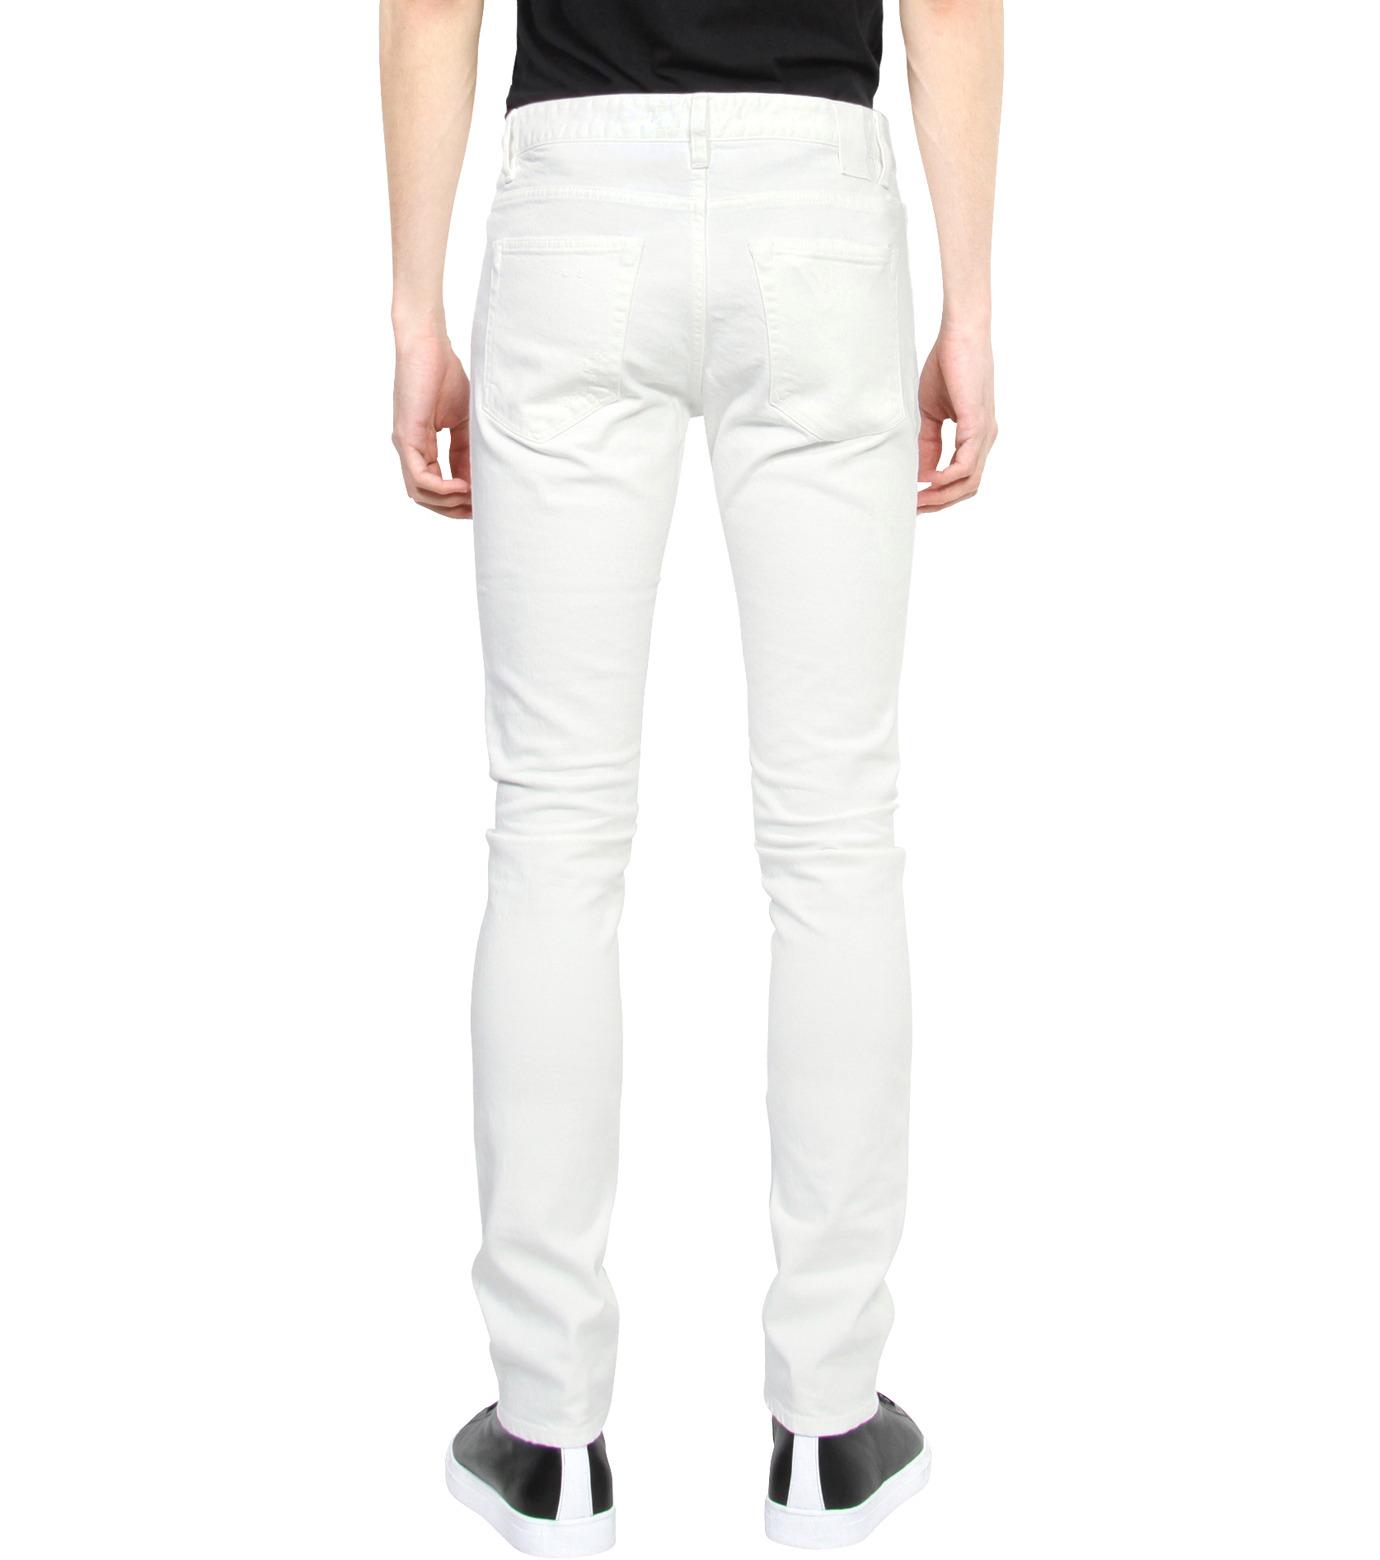 HL HEDDIE LOVU(エイチエル・エディールーヴ)のWhite Damage Denim-WHITE(パンツ/pants)-17S98002-4 拡大詳細画像2